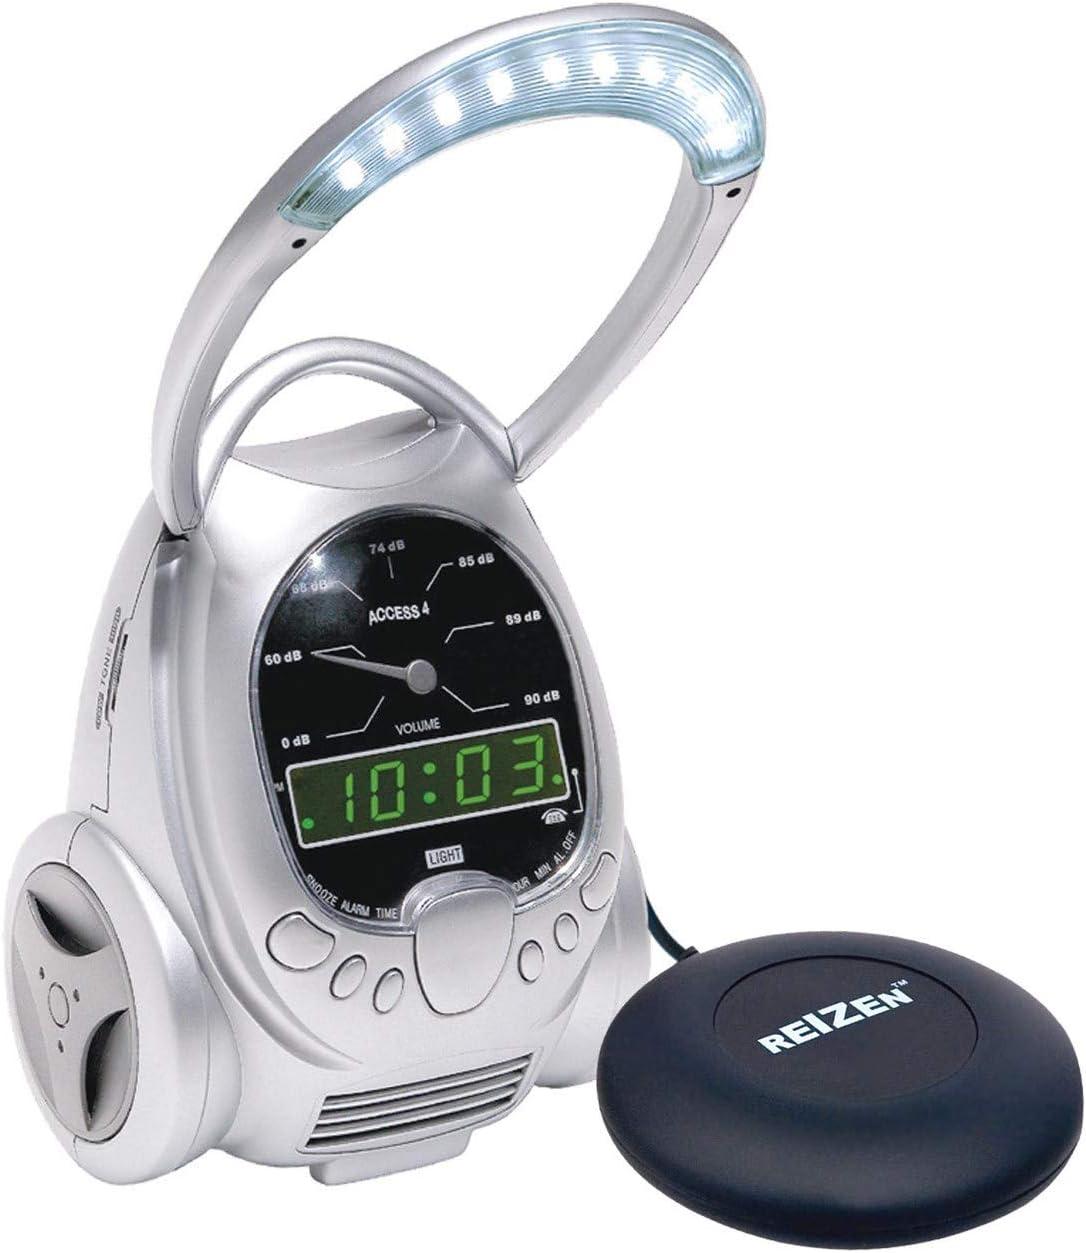 2-in-1 Combo Access 4 Alarm Clock with Vibrating Reizen Bedshaker